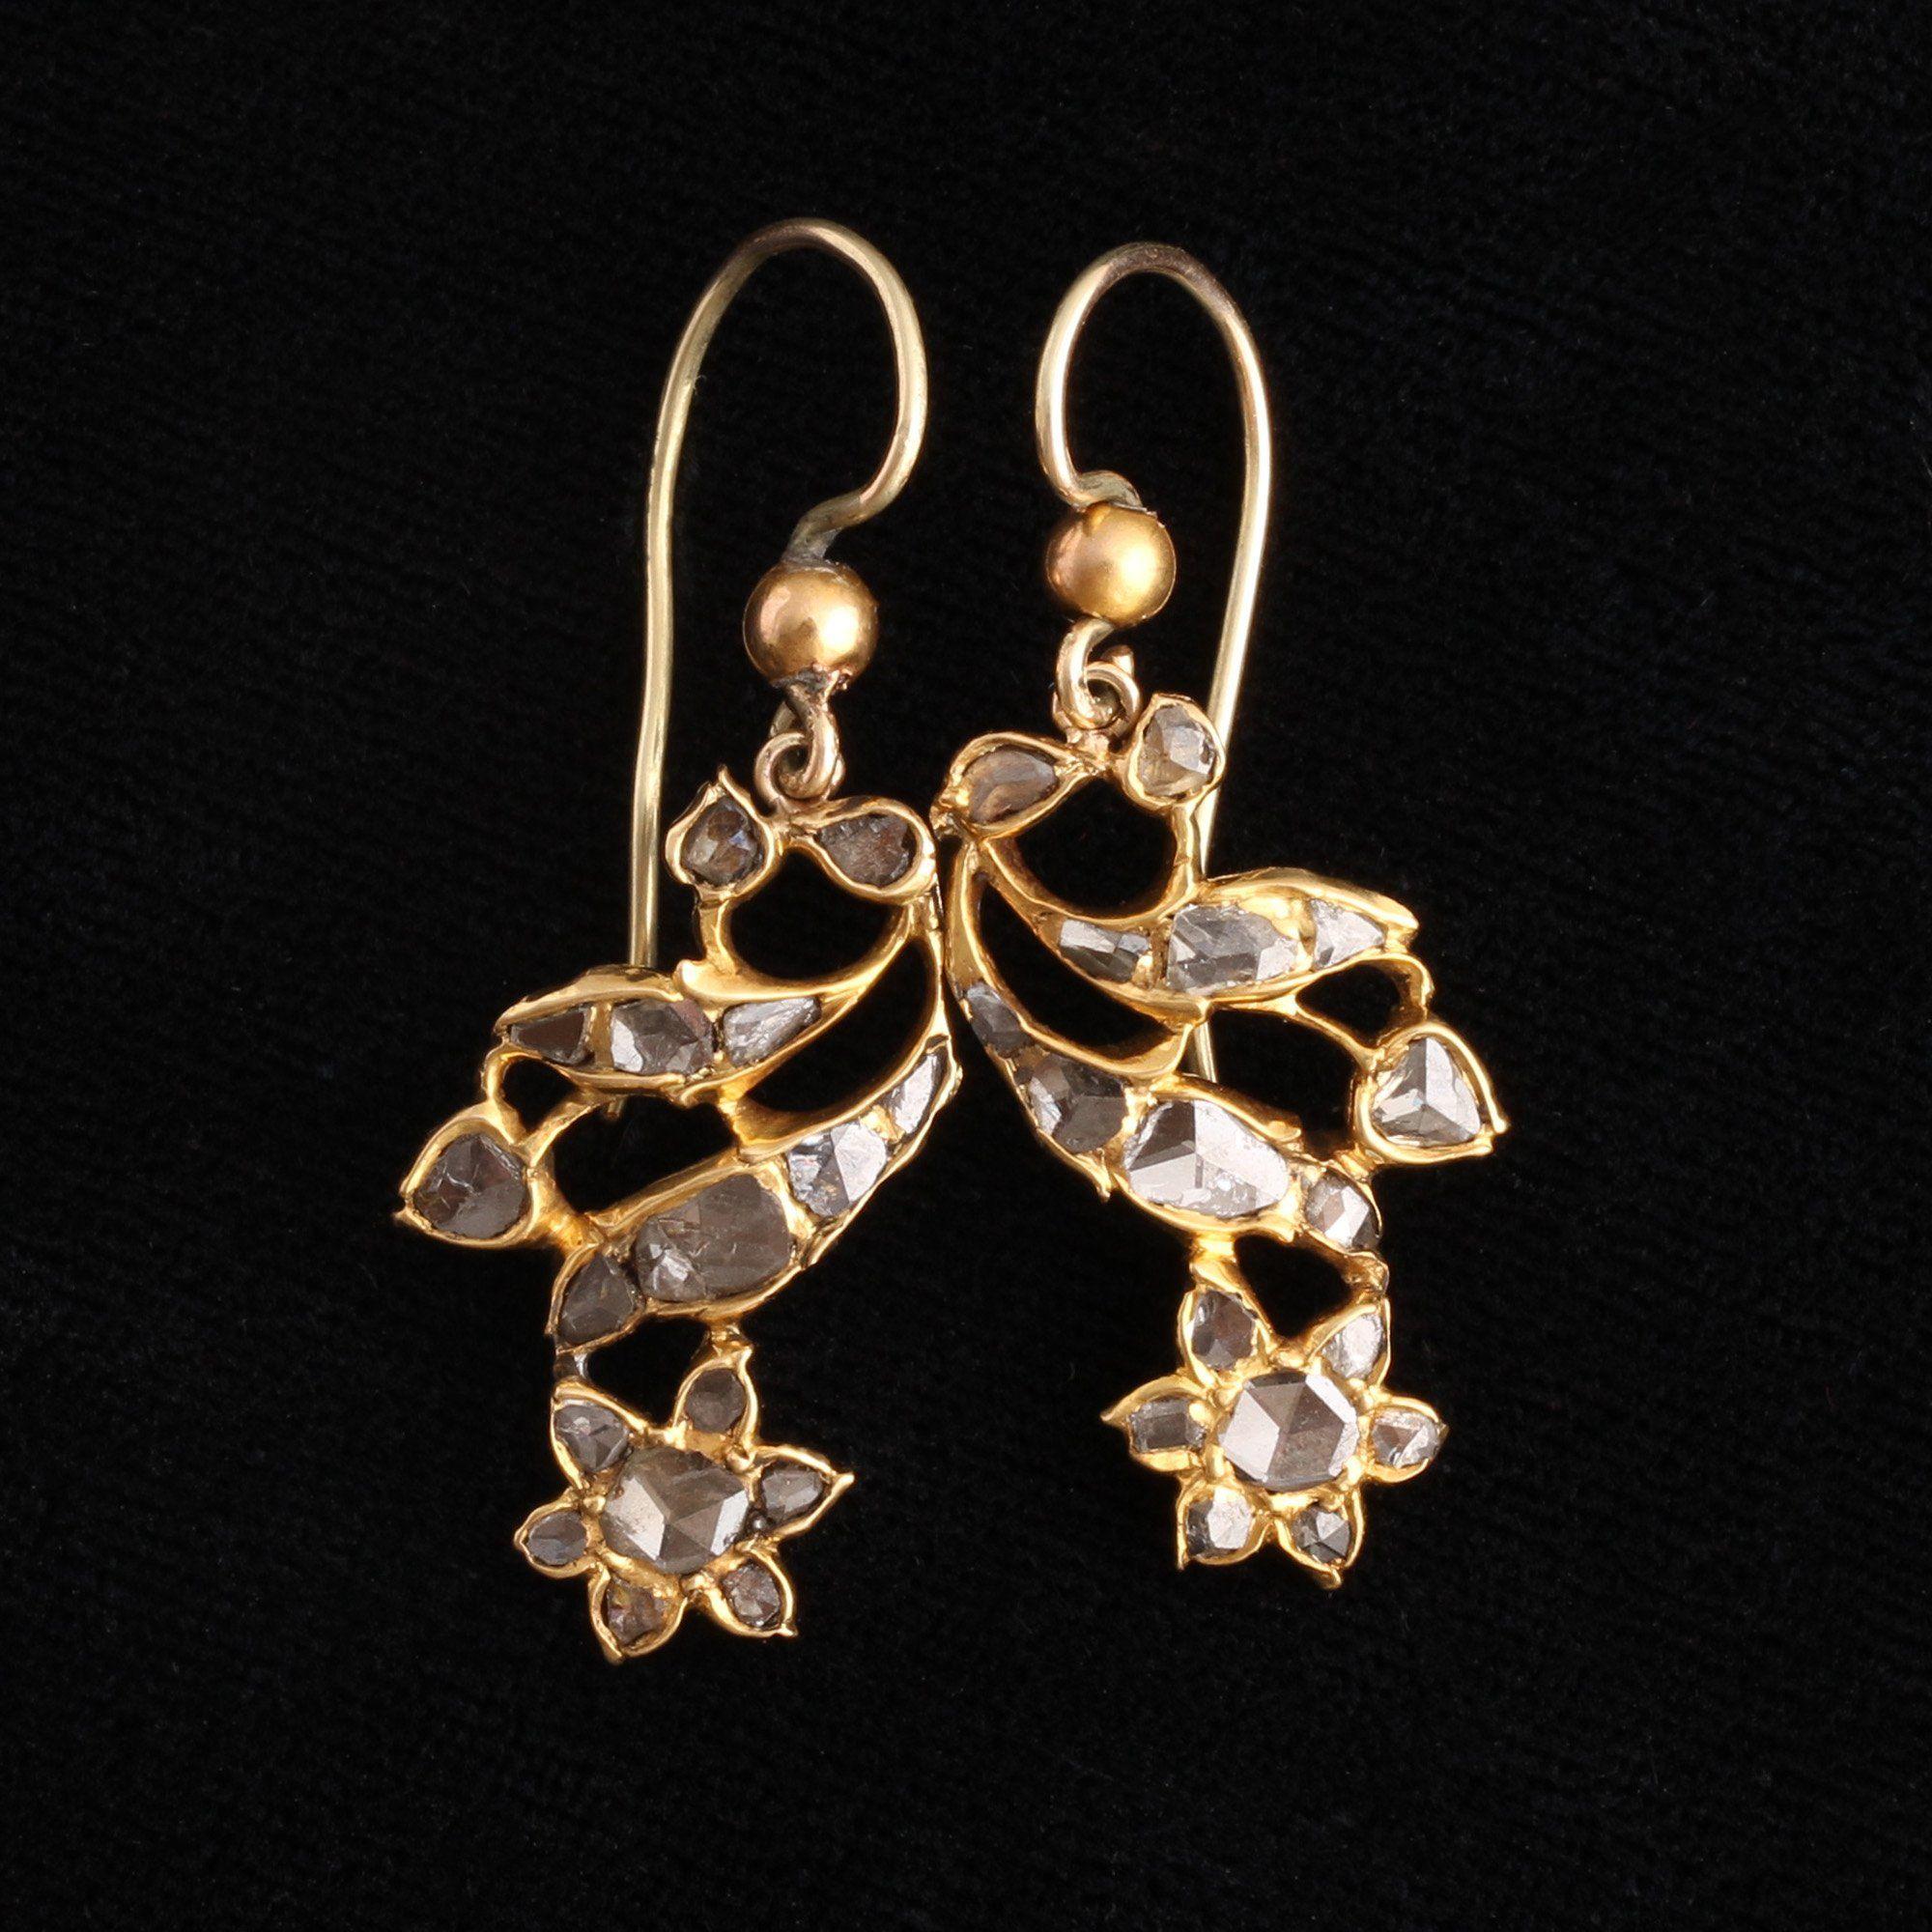 Georgian Rose Cut Diamond Flower Earrings